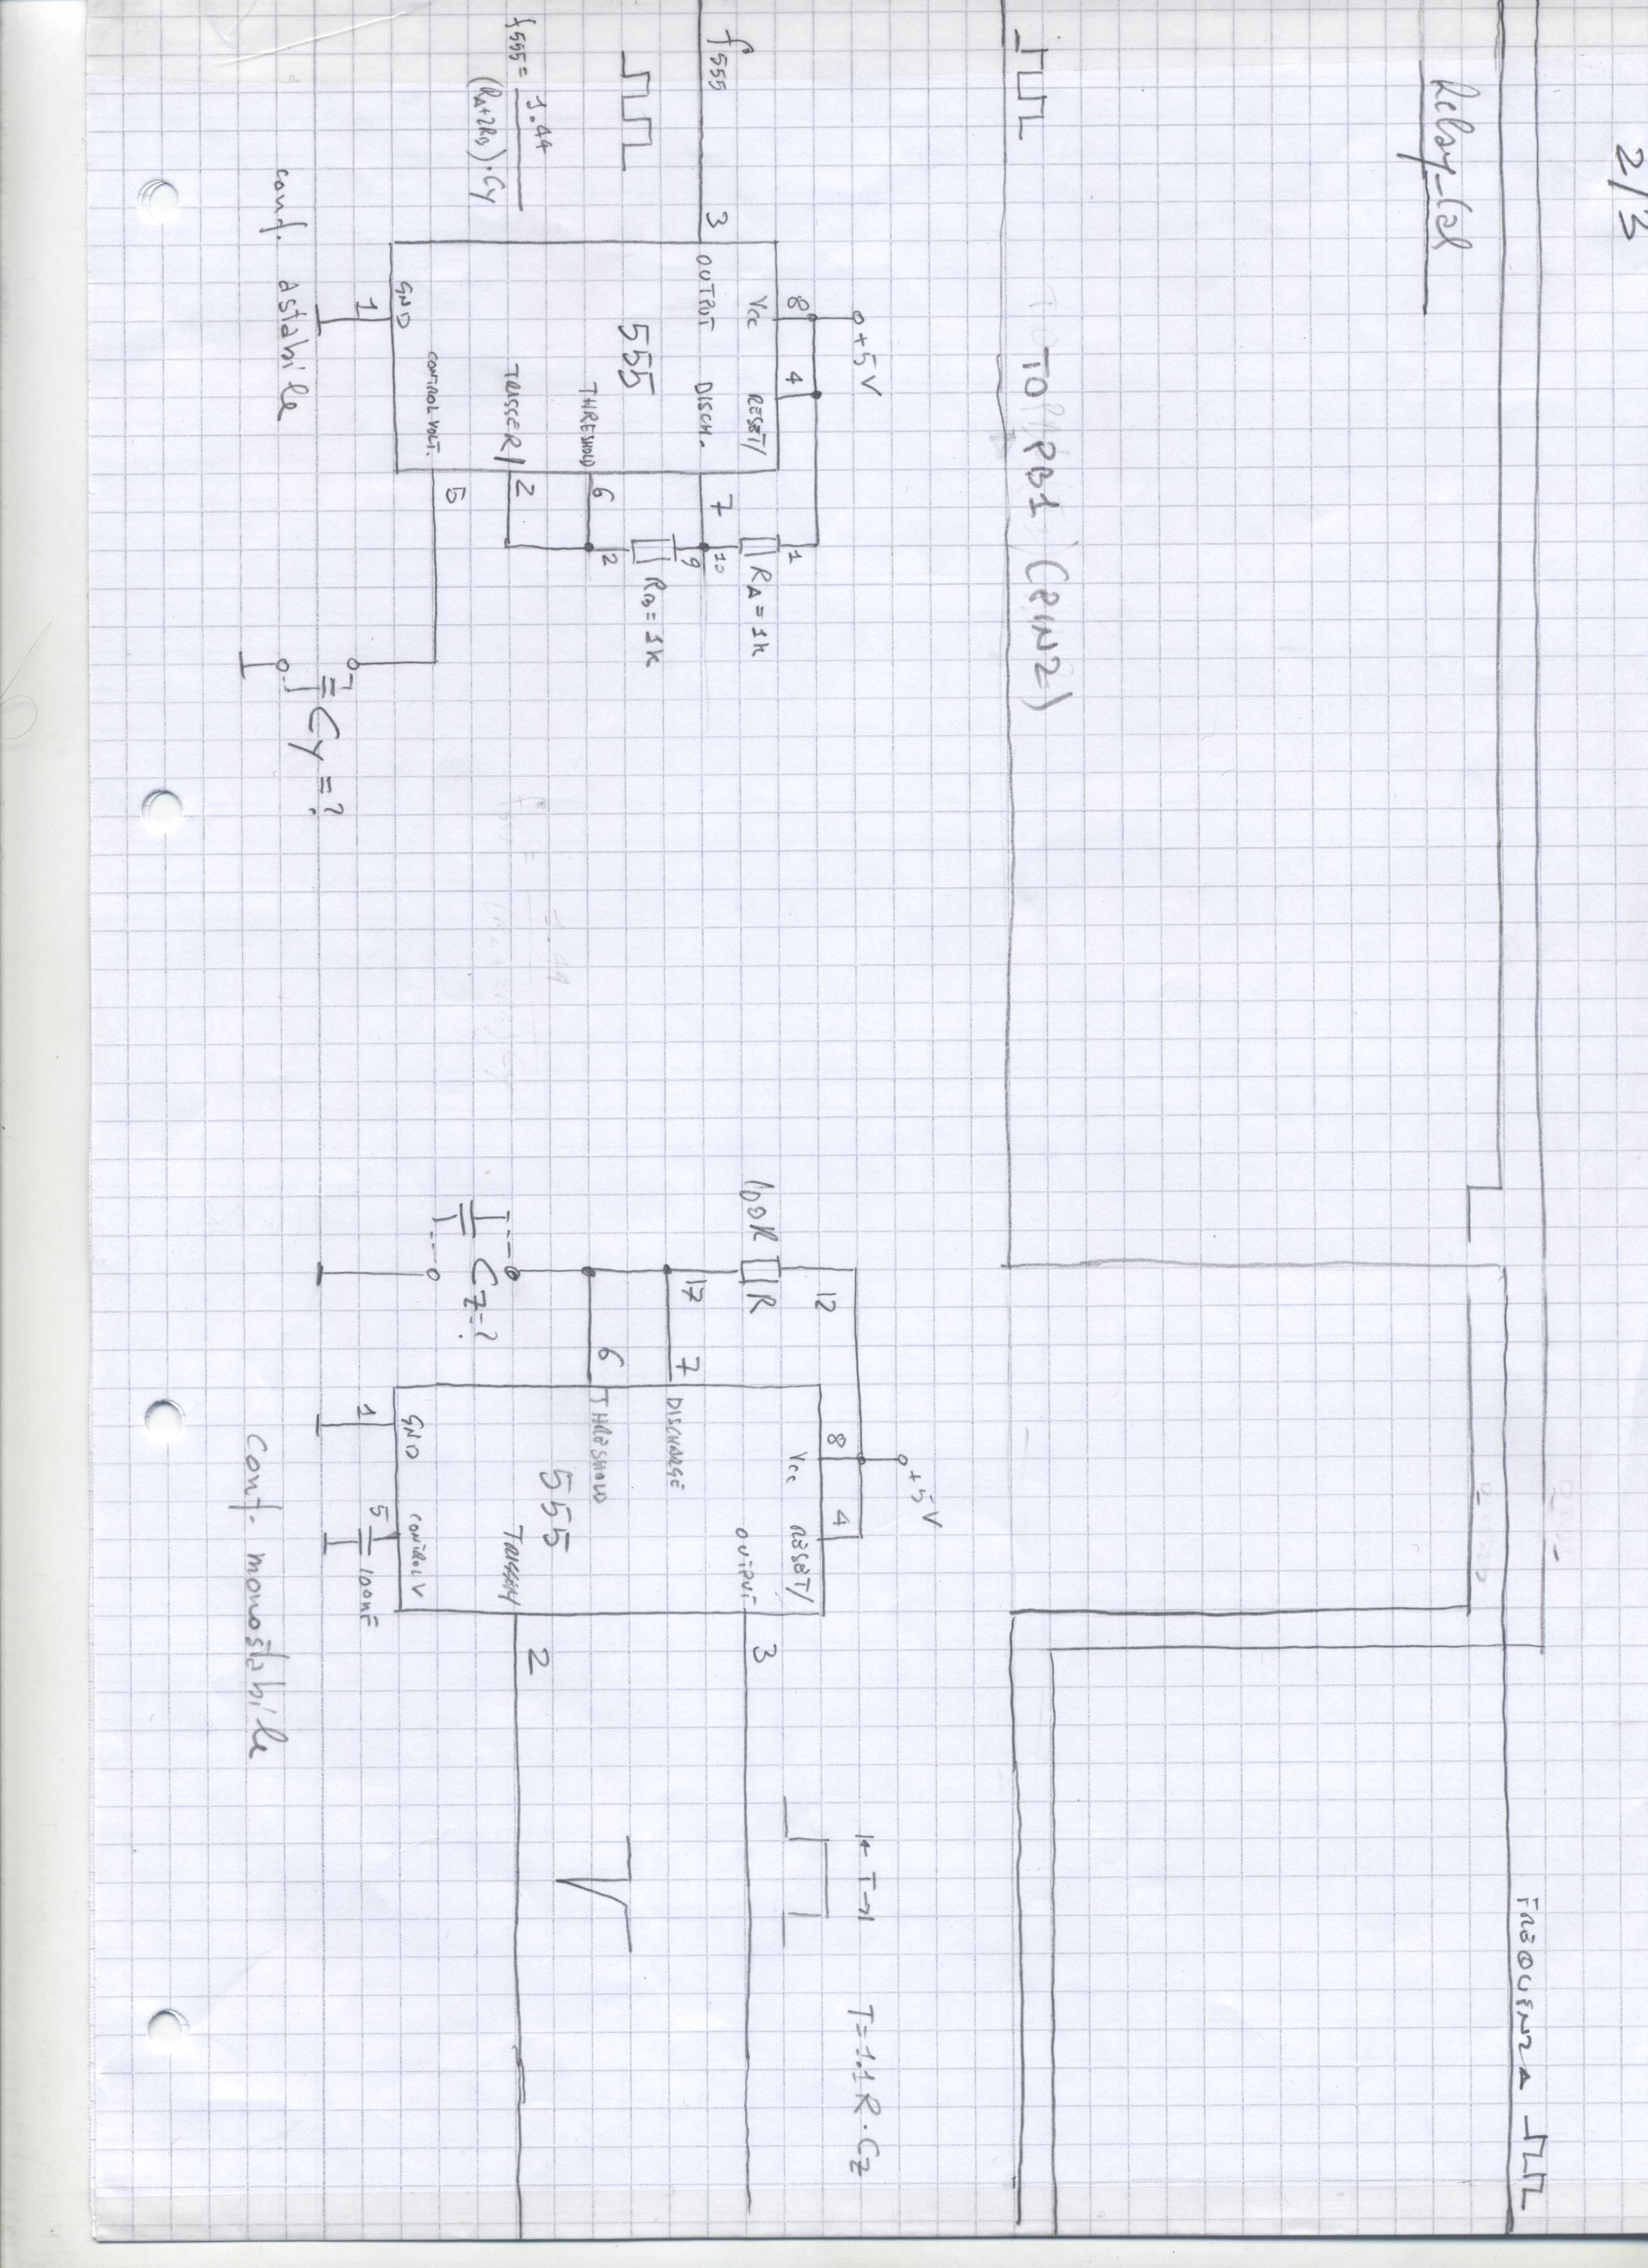 Lc Meter Diagram Giuseppe Talarico